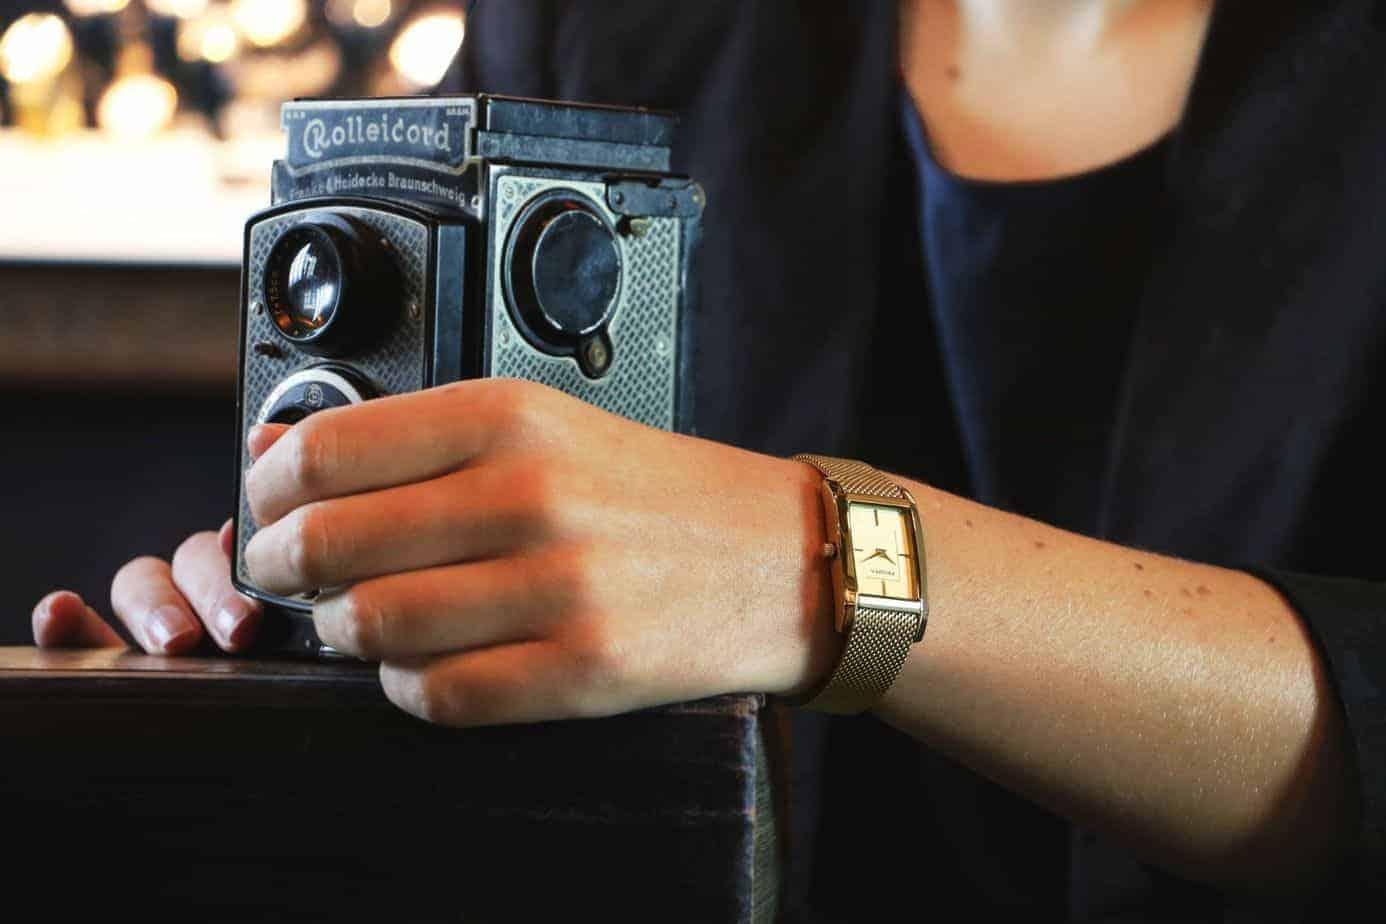 prisma horloges atone milan mooi dameshorloge dameshorloges horloges voor vrouwen